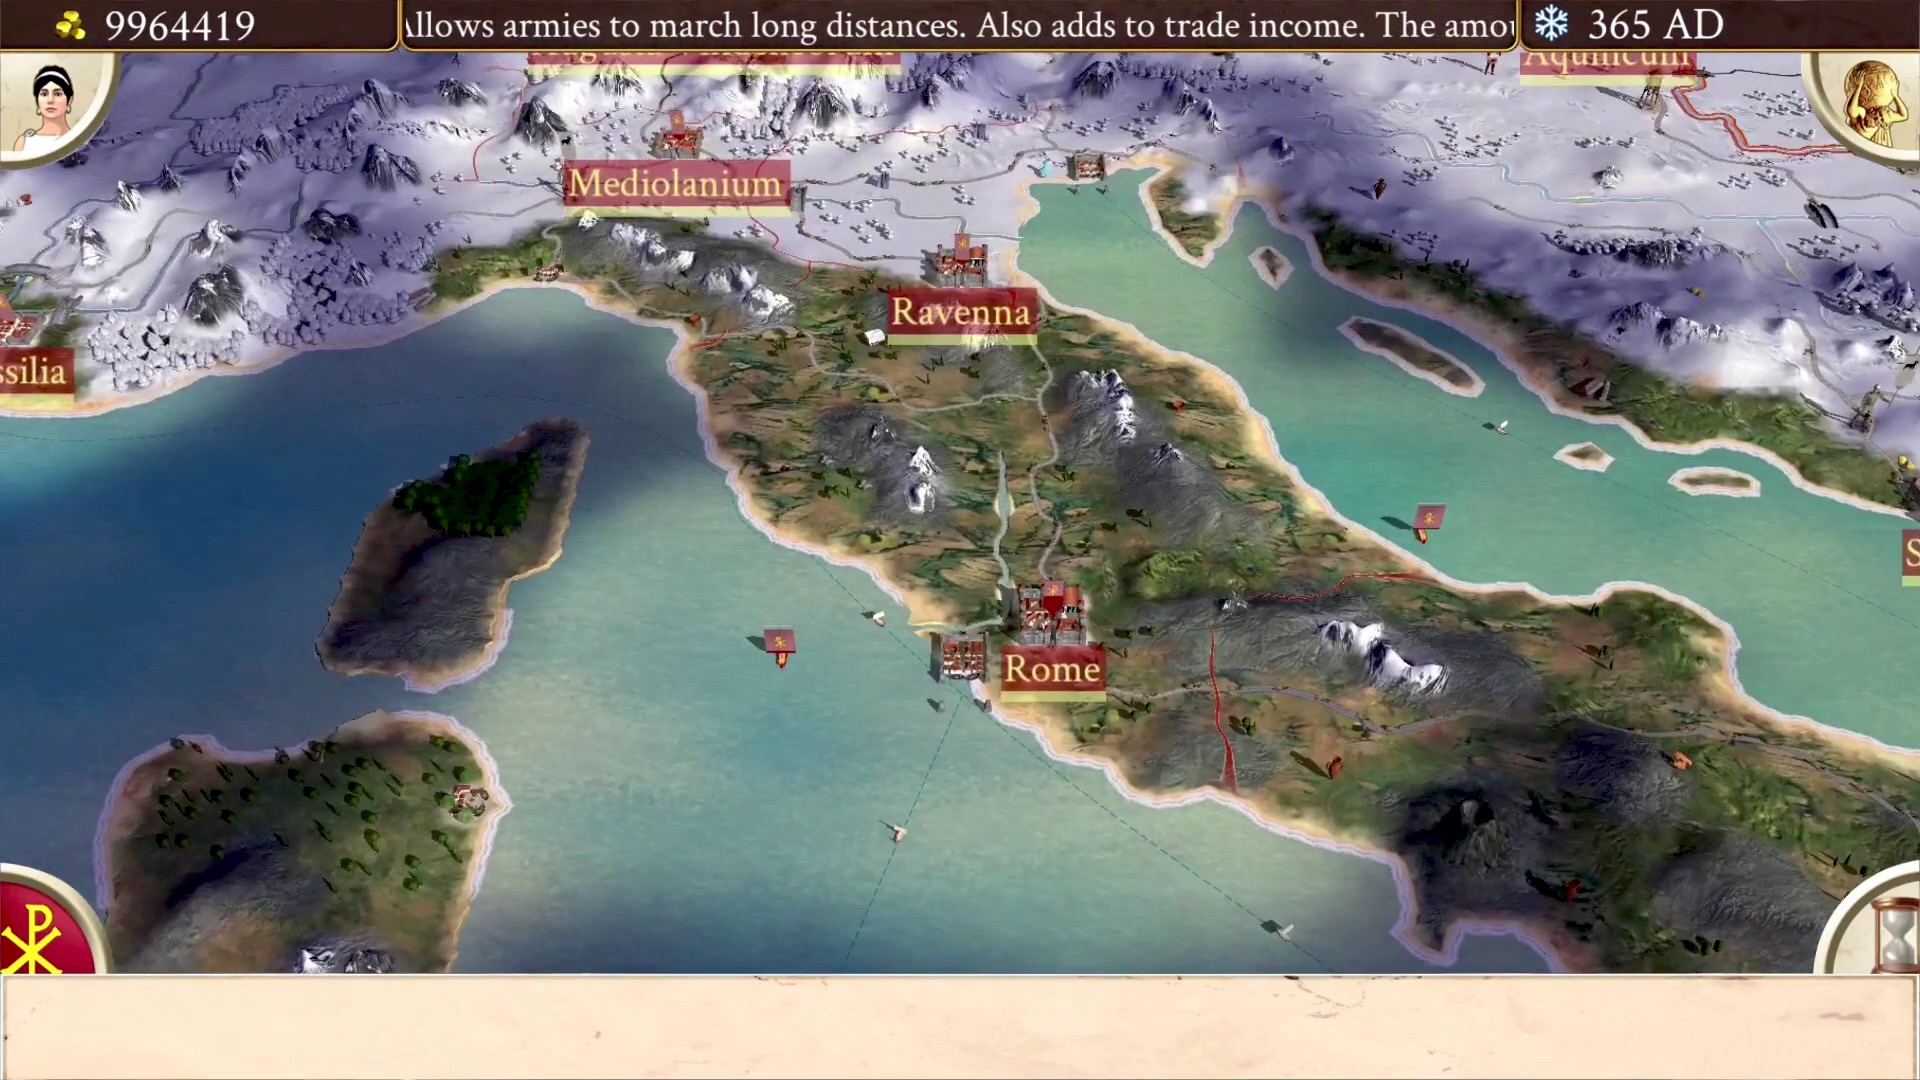 Après l'iPad, les barbares envahissent l'iPhone dans l'excellent Rome Total War : disponible ! 1